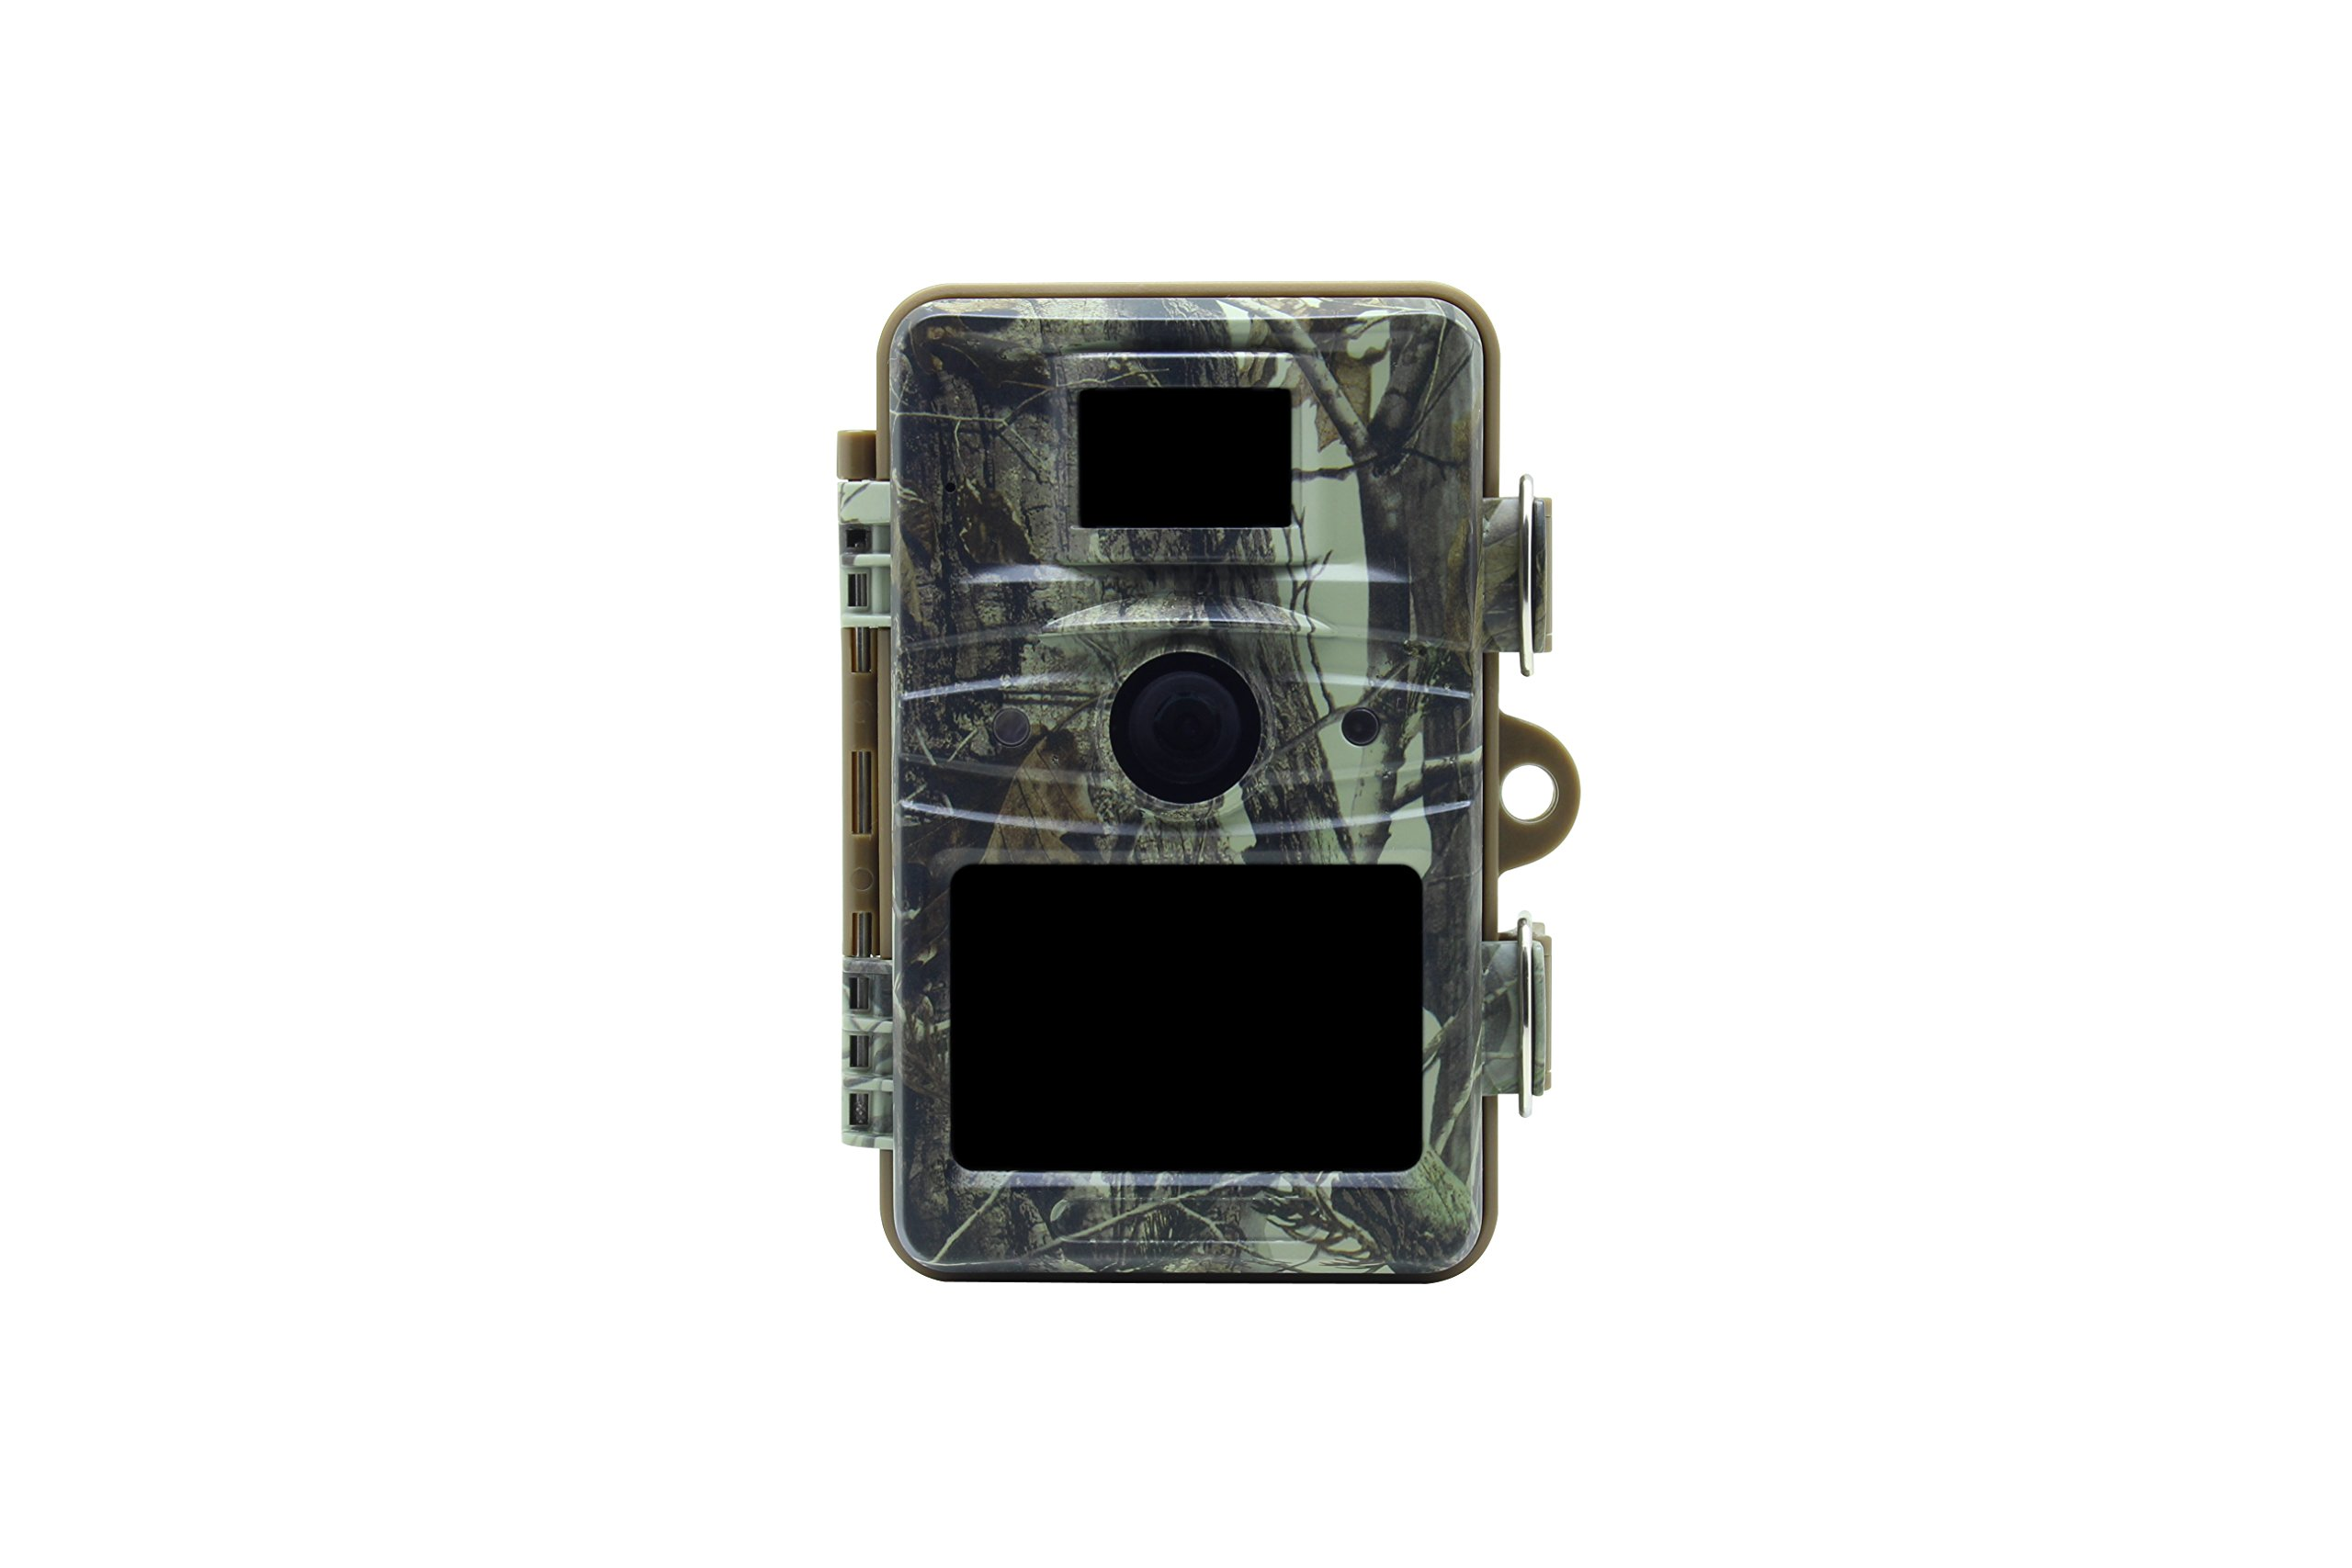 MDTEK 16GB SD Card RD1005 Hunting Trail Camera Trap 12MP Wildlife Game Cameras HD Night Vision Waterproof IP66 Hunter Trail Camera